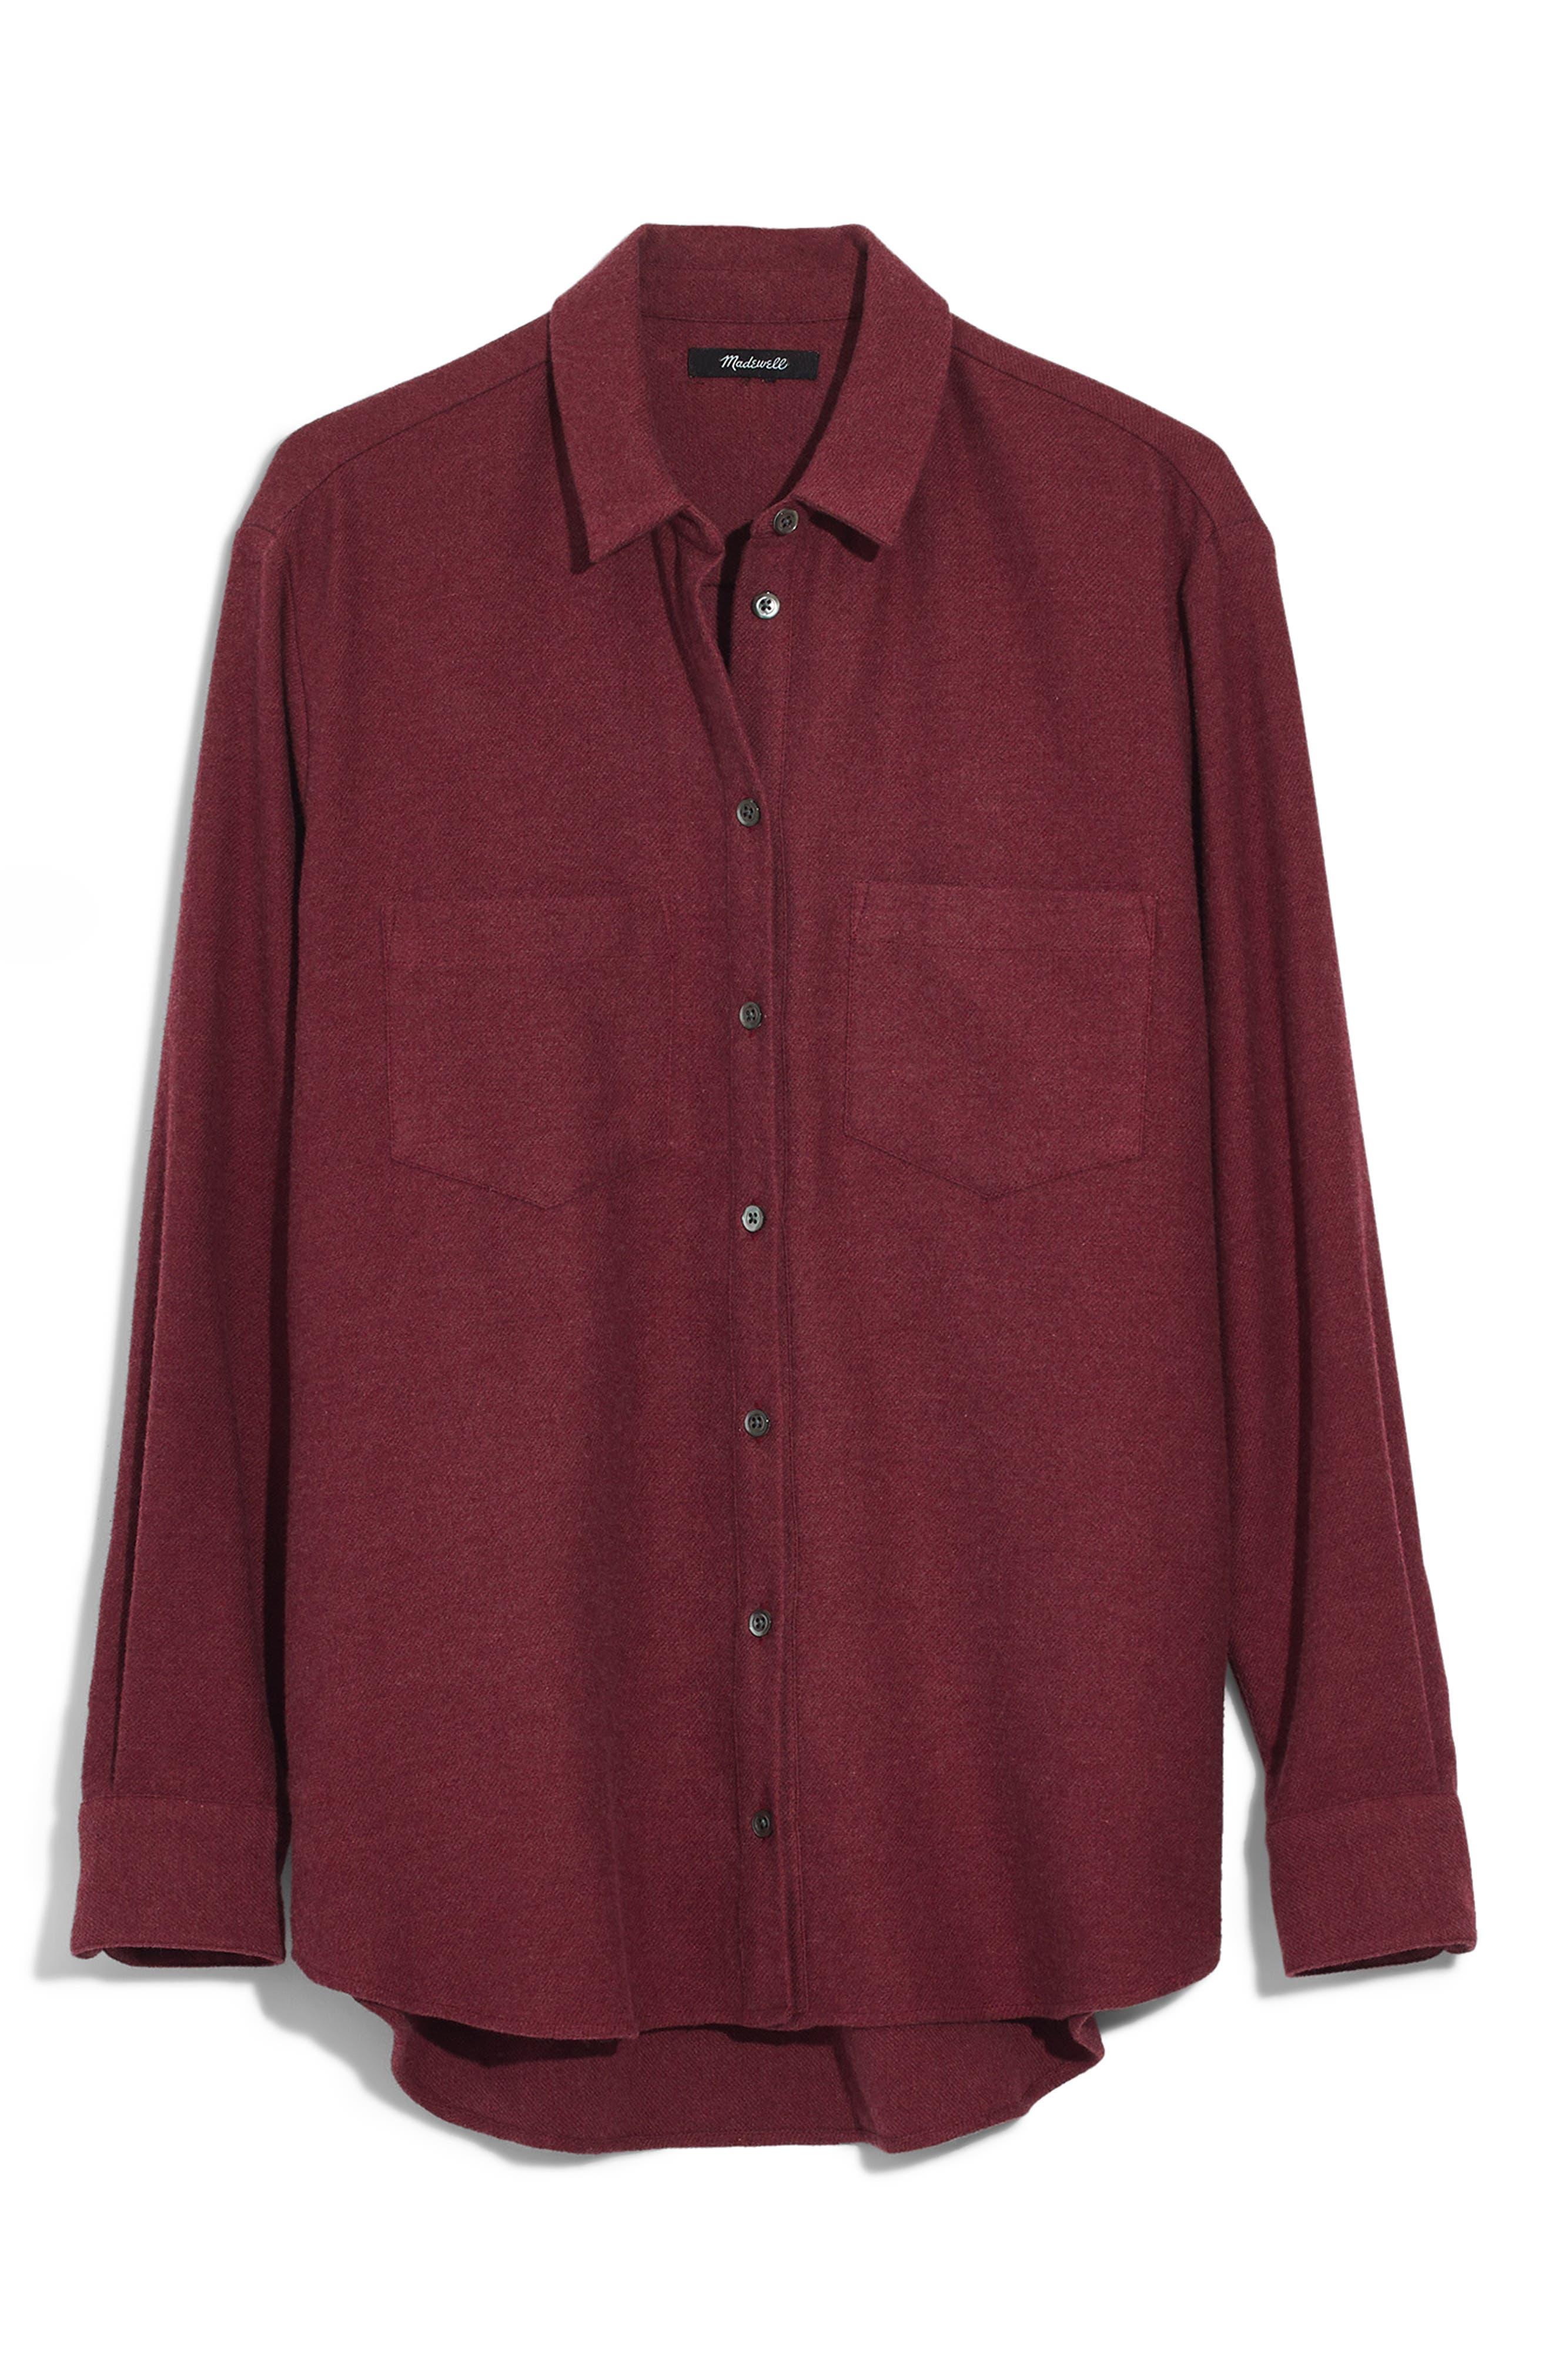 MADEWELL,                             Flannel Sunday Shirt,                             Alternate thumbnail 6, color,                             600